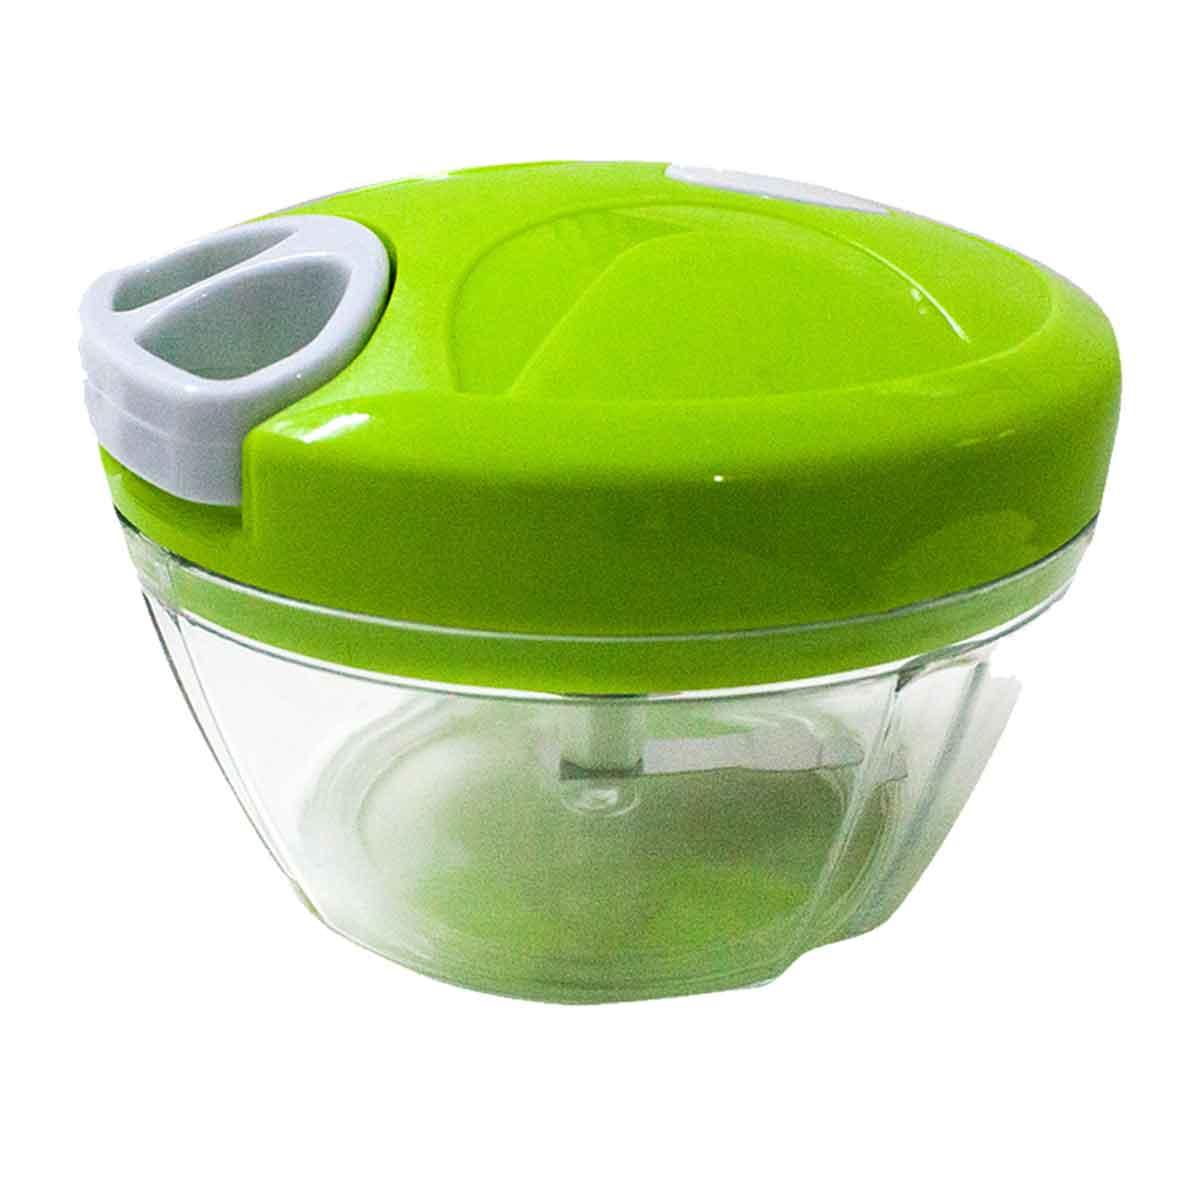 Triturador Cortador Alho Cebola Processador Alimentos Manual Cor: Verde